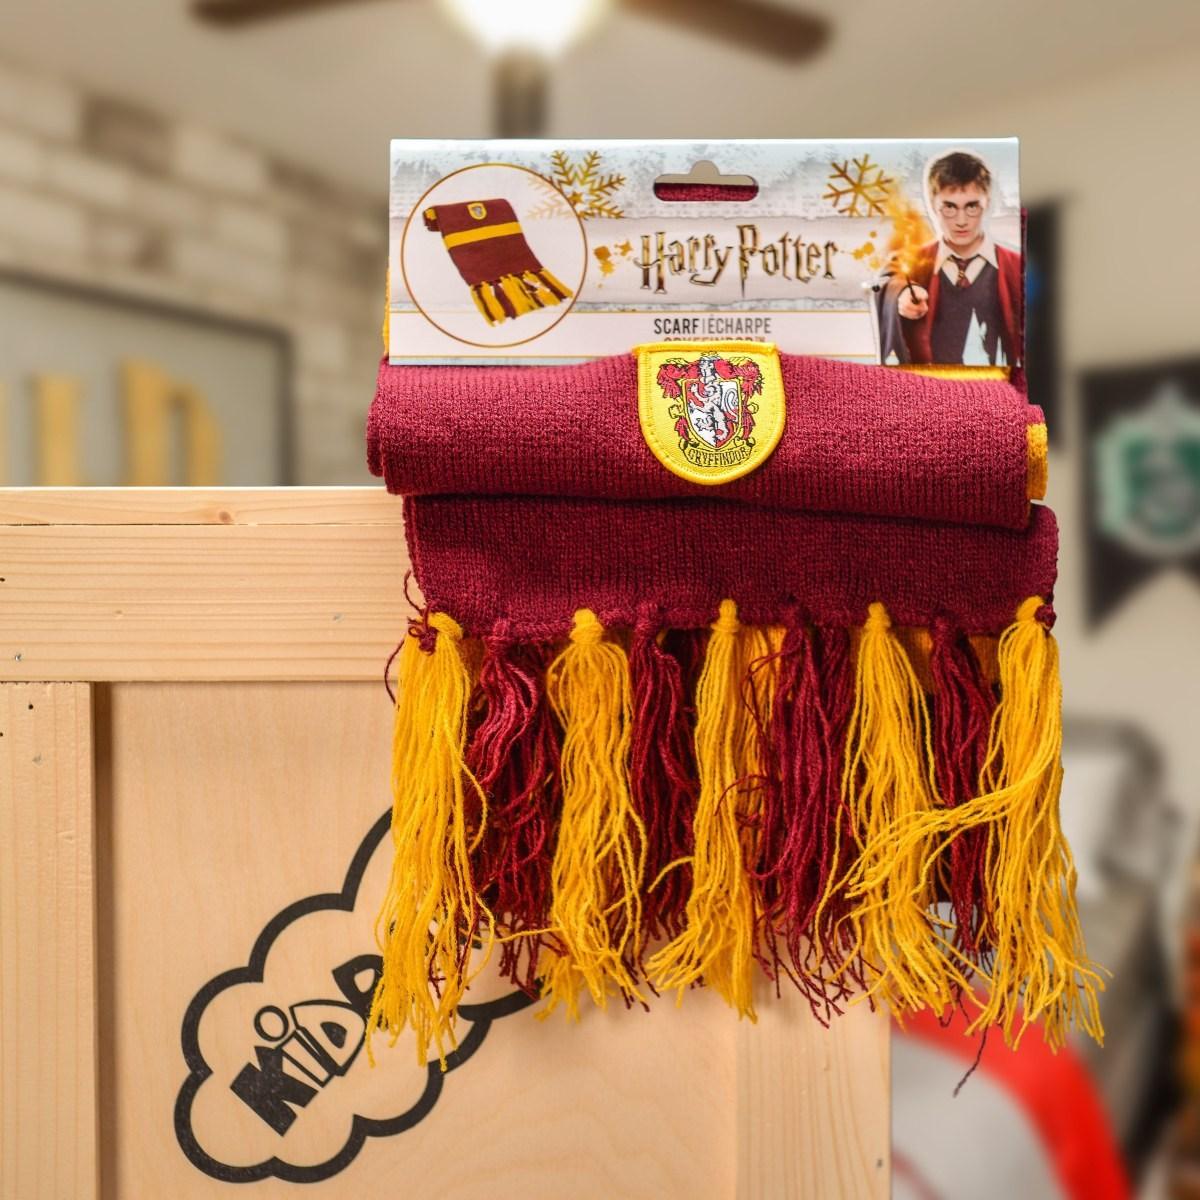 Harry Potter Kidboxeo XXL